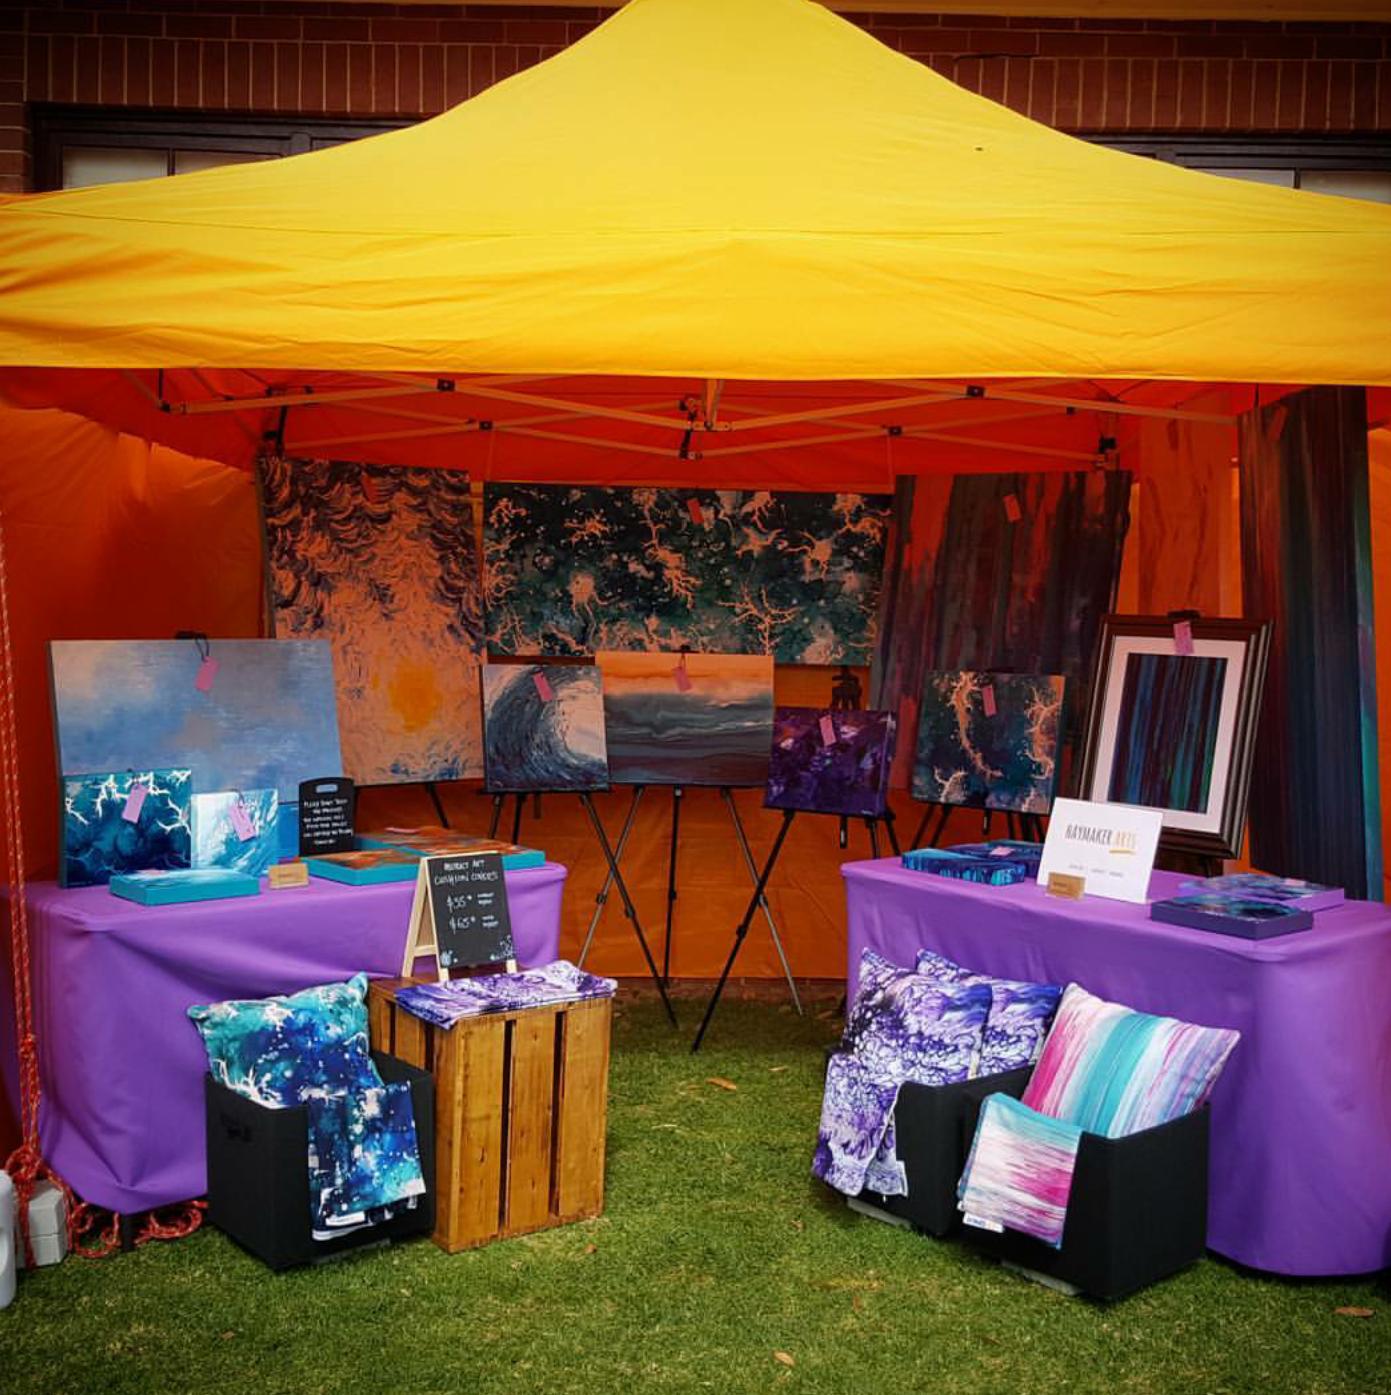 Market stall set up